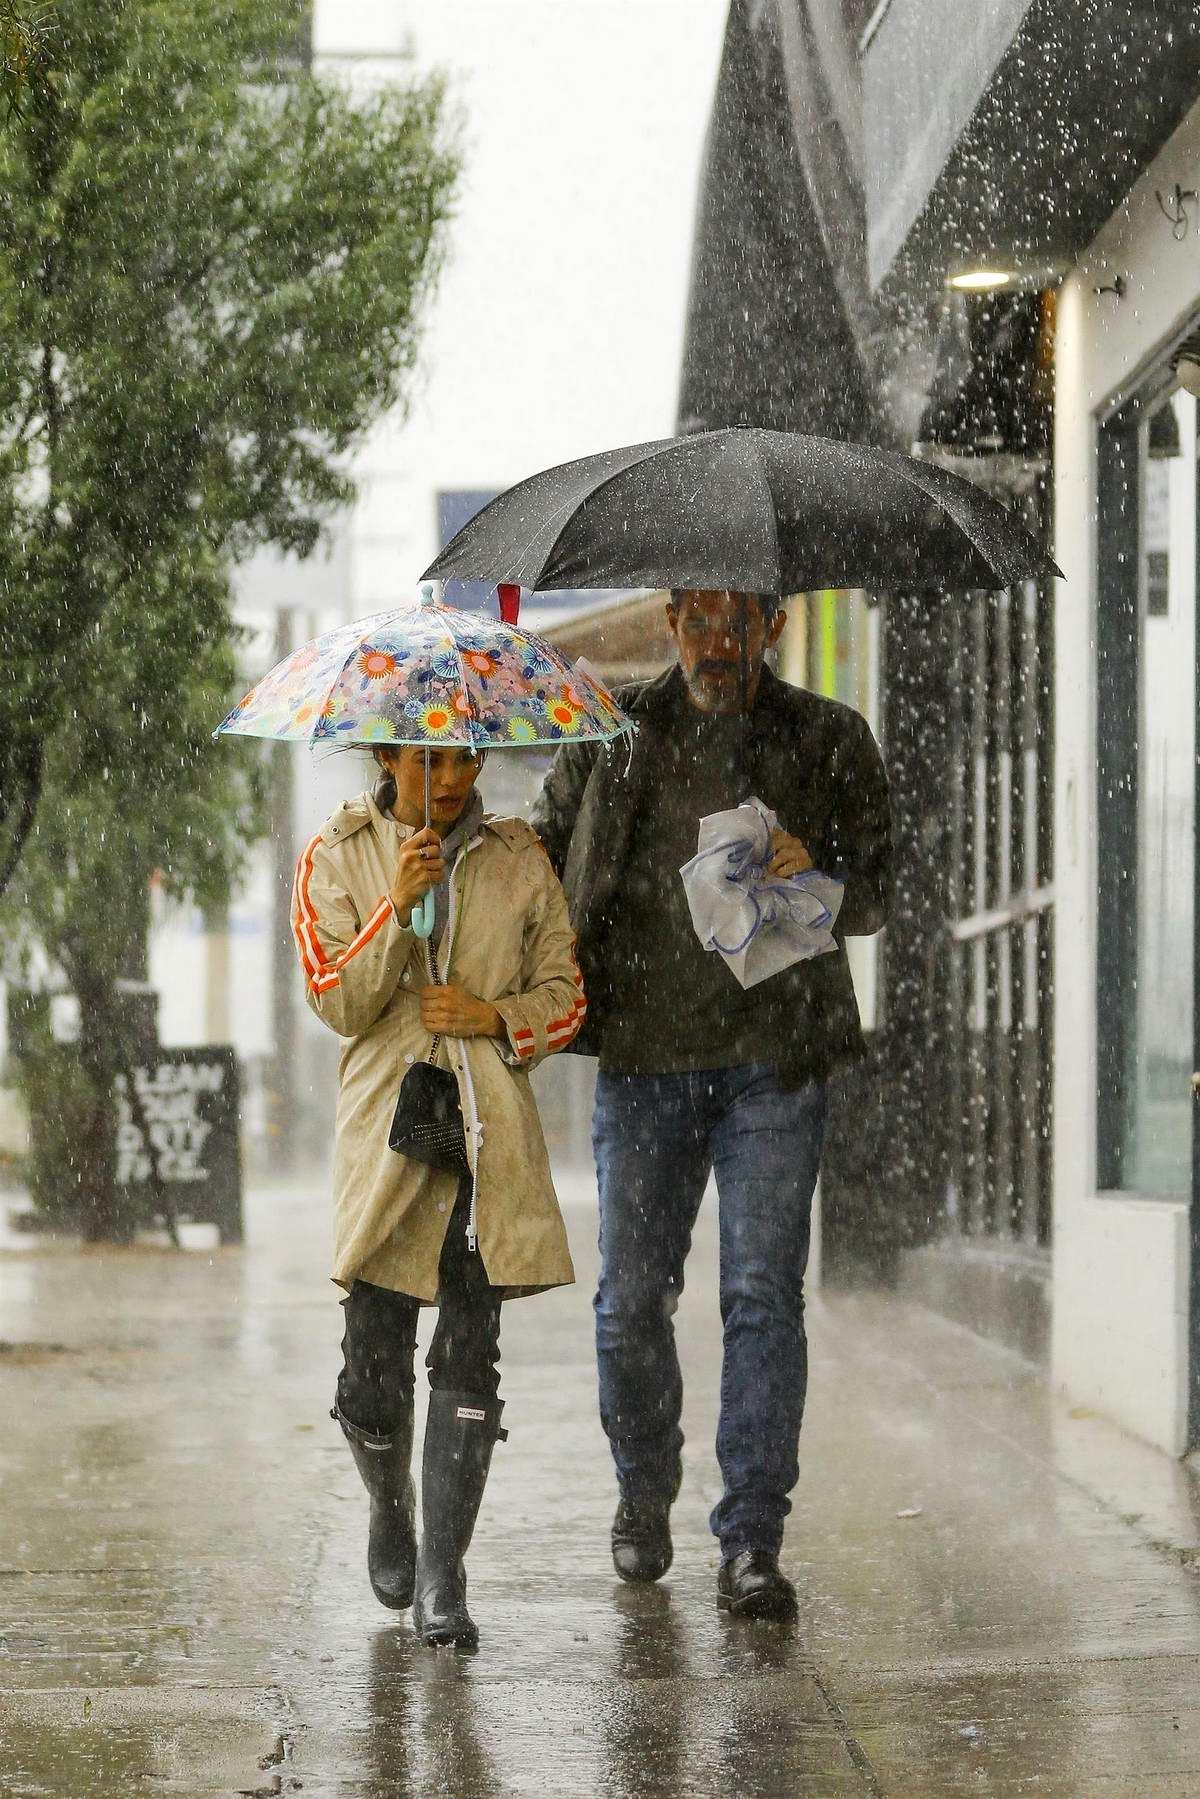 Jenna Dewan and boyfriend Steve Kazee brave heavy rain to run errands in Los Angeles